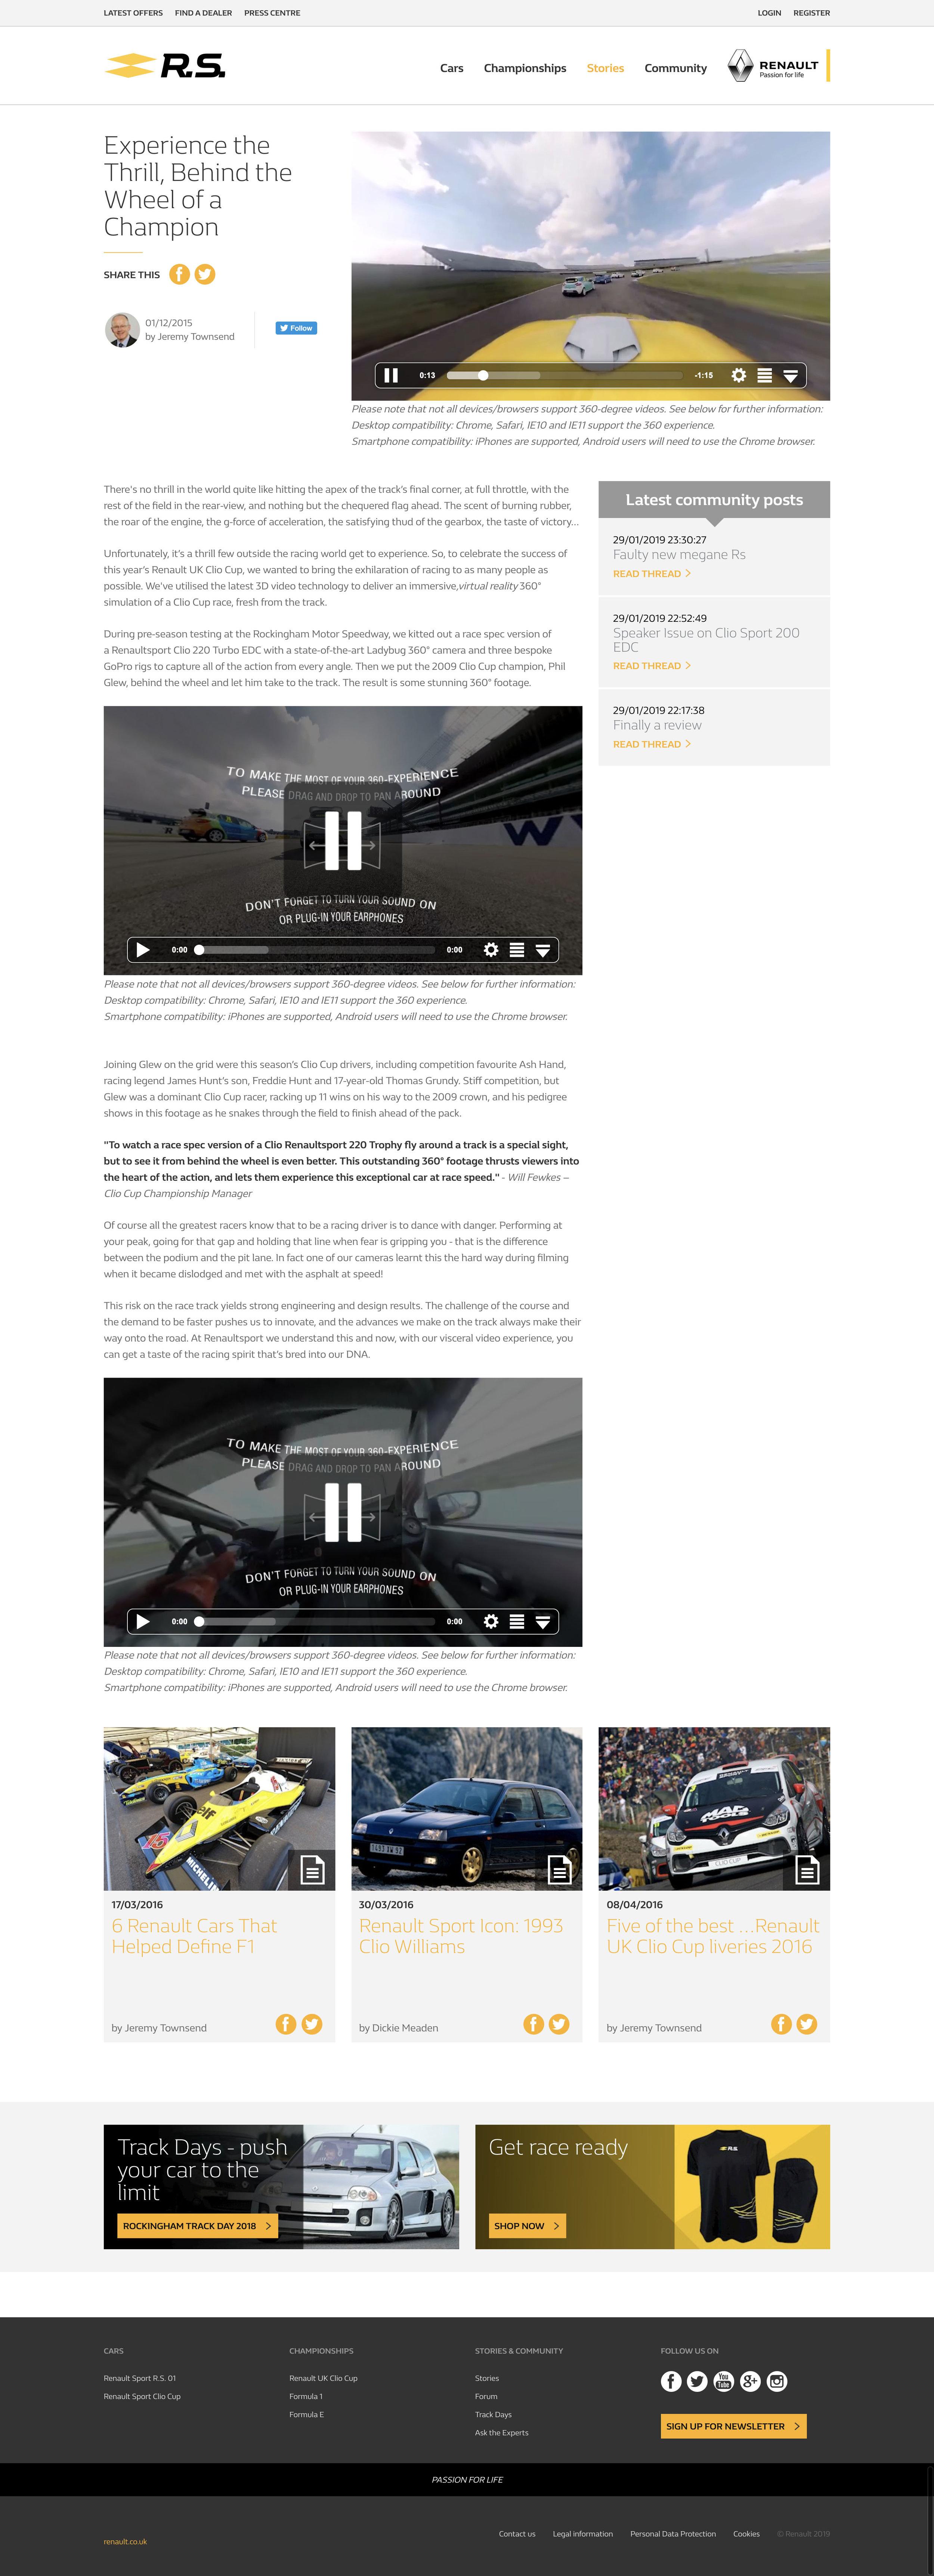 RenaultSport360.jpg